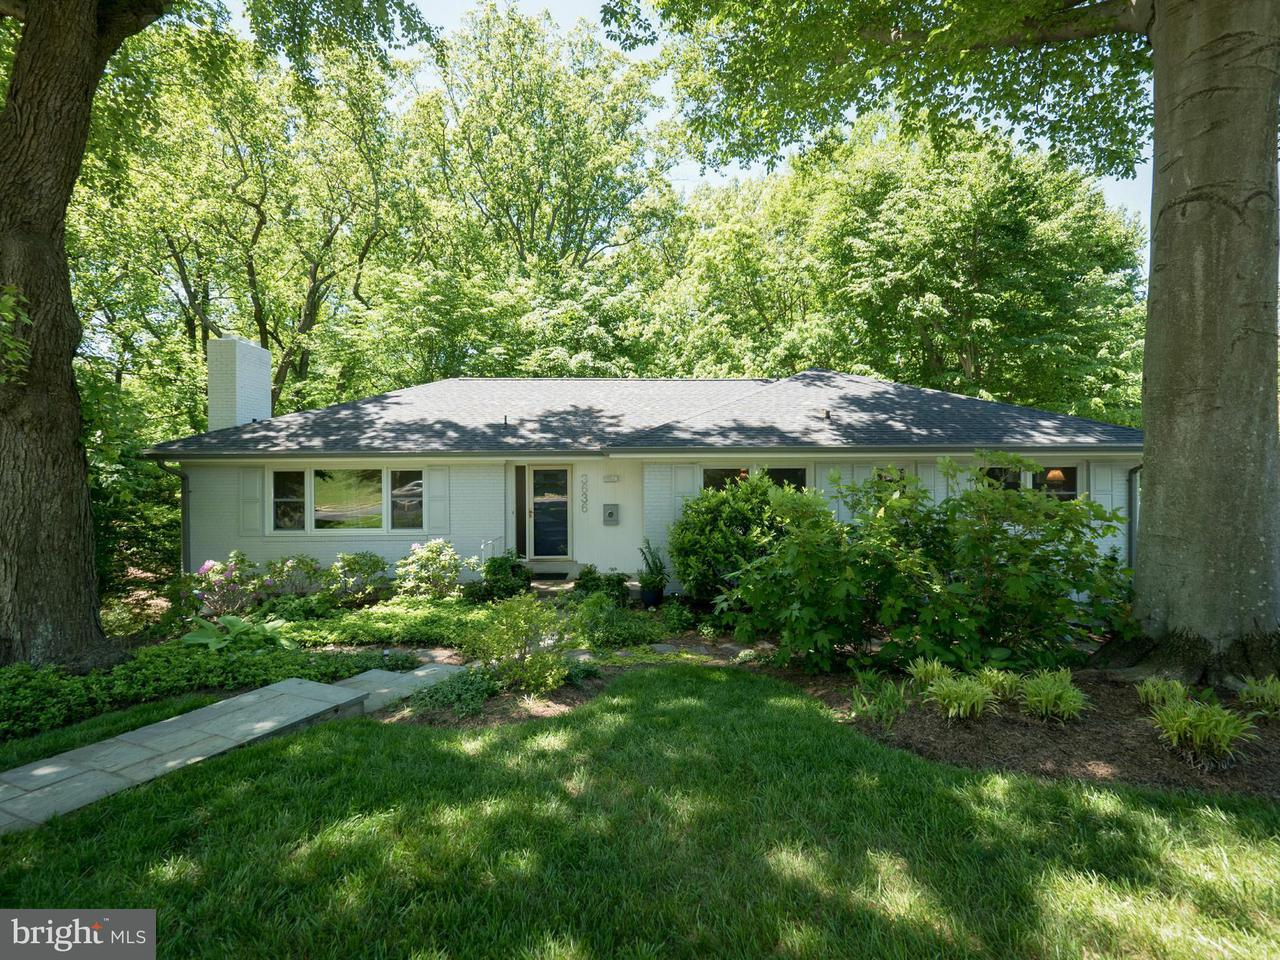 Single Family Home for Sale at 3636 MONROE ST N 3636 MONROE ST N Arlington, Virginia 22207 United States